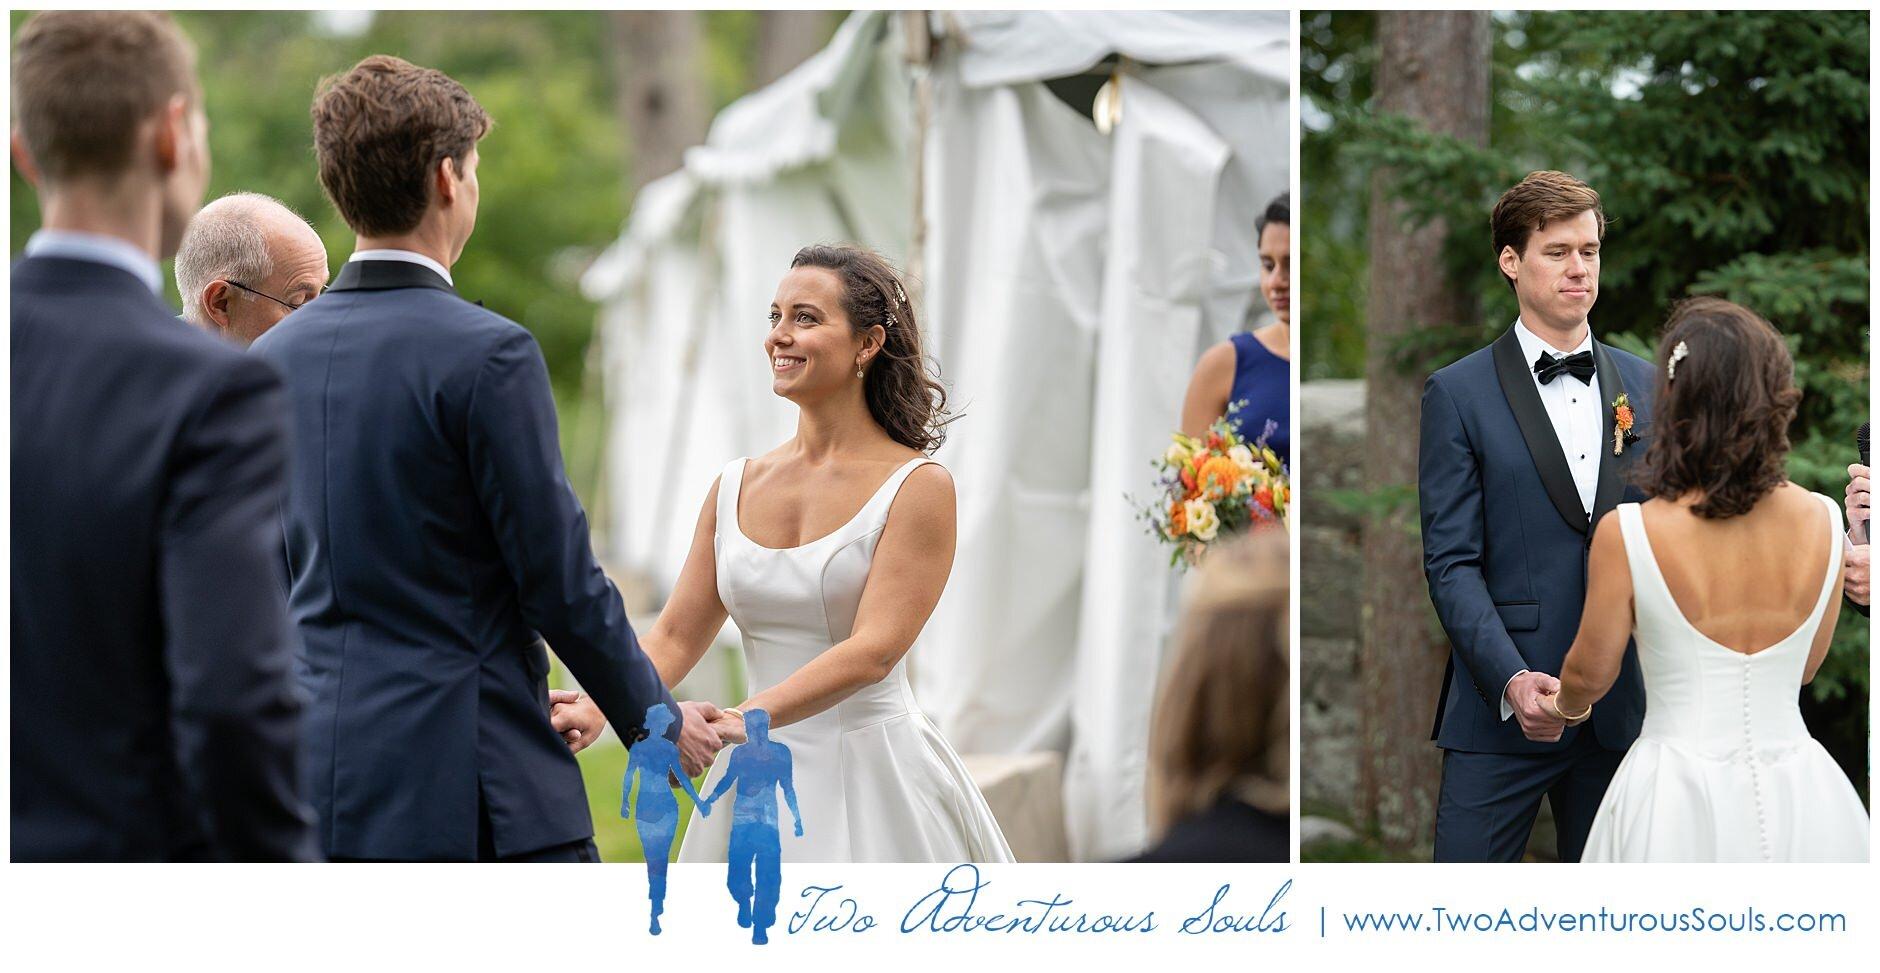 Bar Harbor Wedding Photographers, Acadia Bay Inn Wedding Photographers, Two Adventurous Souls- 091419_0022.jpg